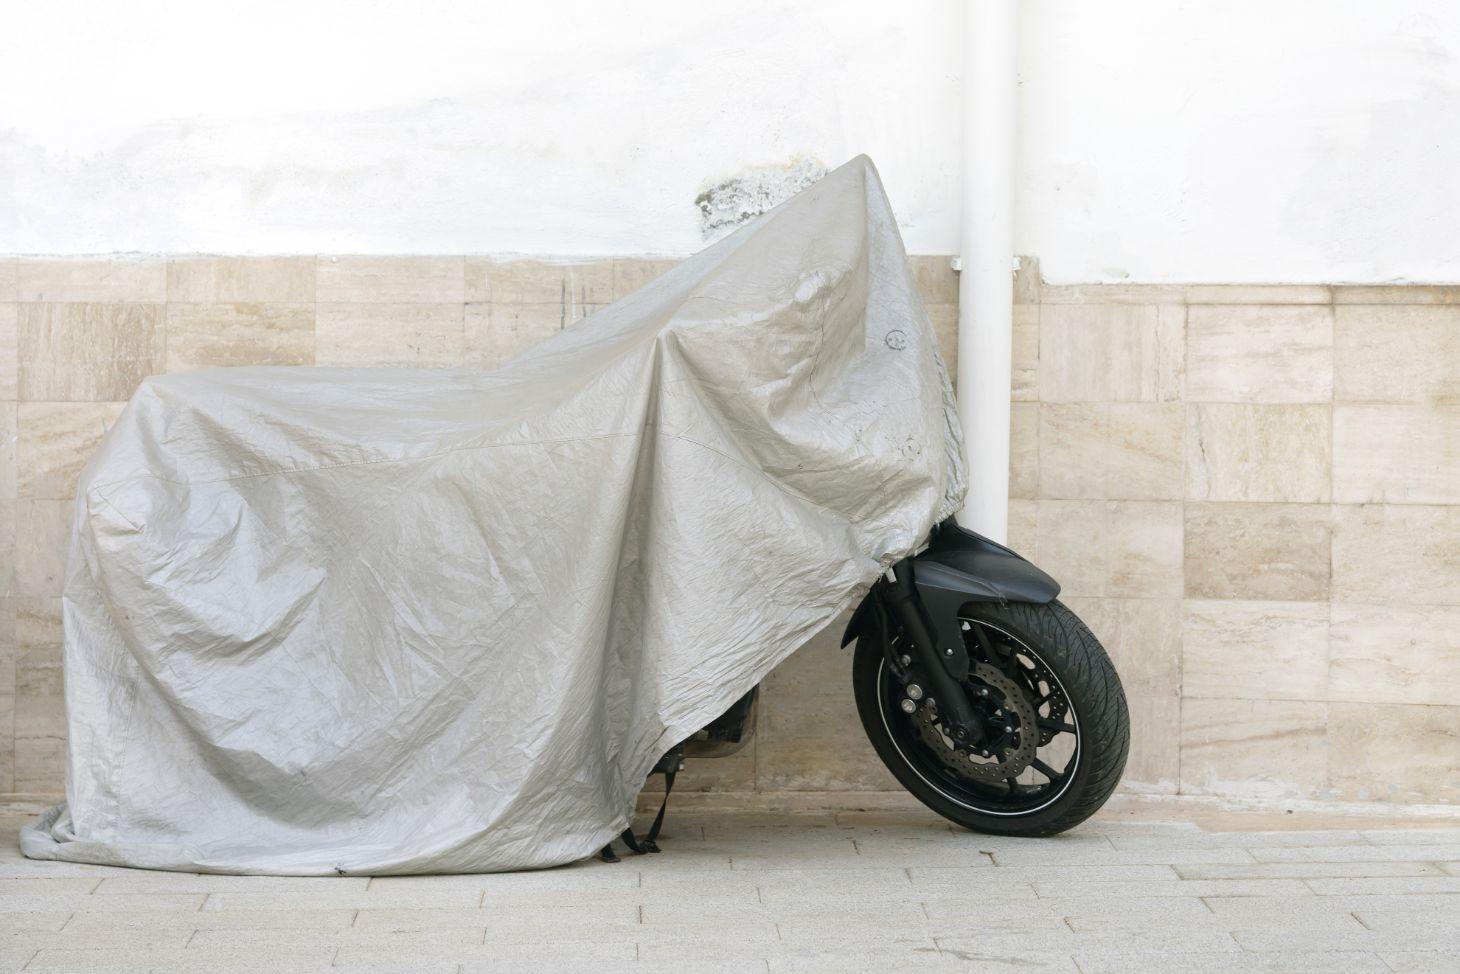 moto coberta por capa shutterstock